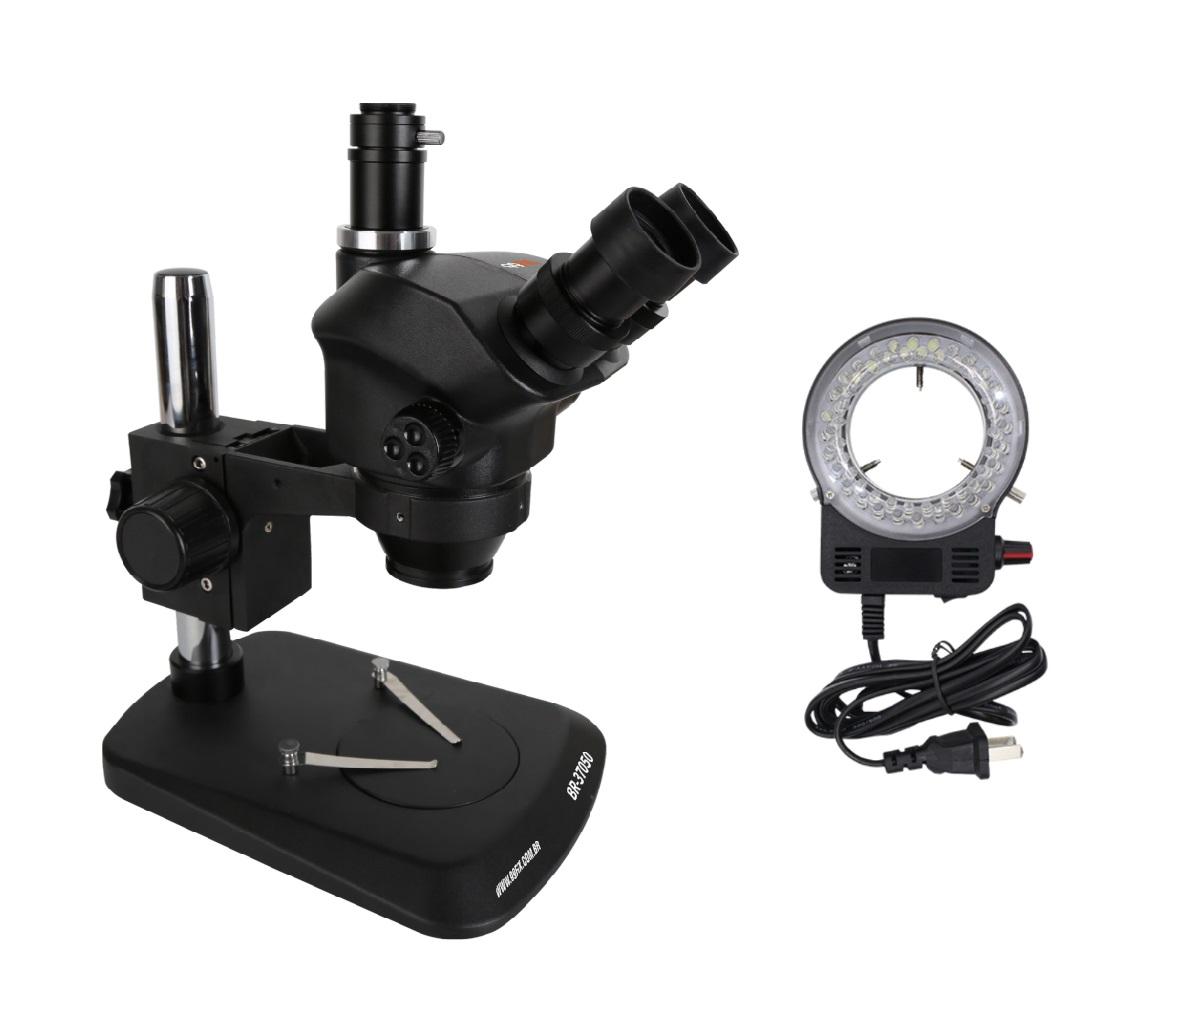 Microscópio Trinocular Simul-Focal 99FIX KS 37050 7X-50X para conserto de telefones celulares Bivoltagens  com Lâmpada LED